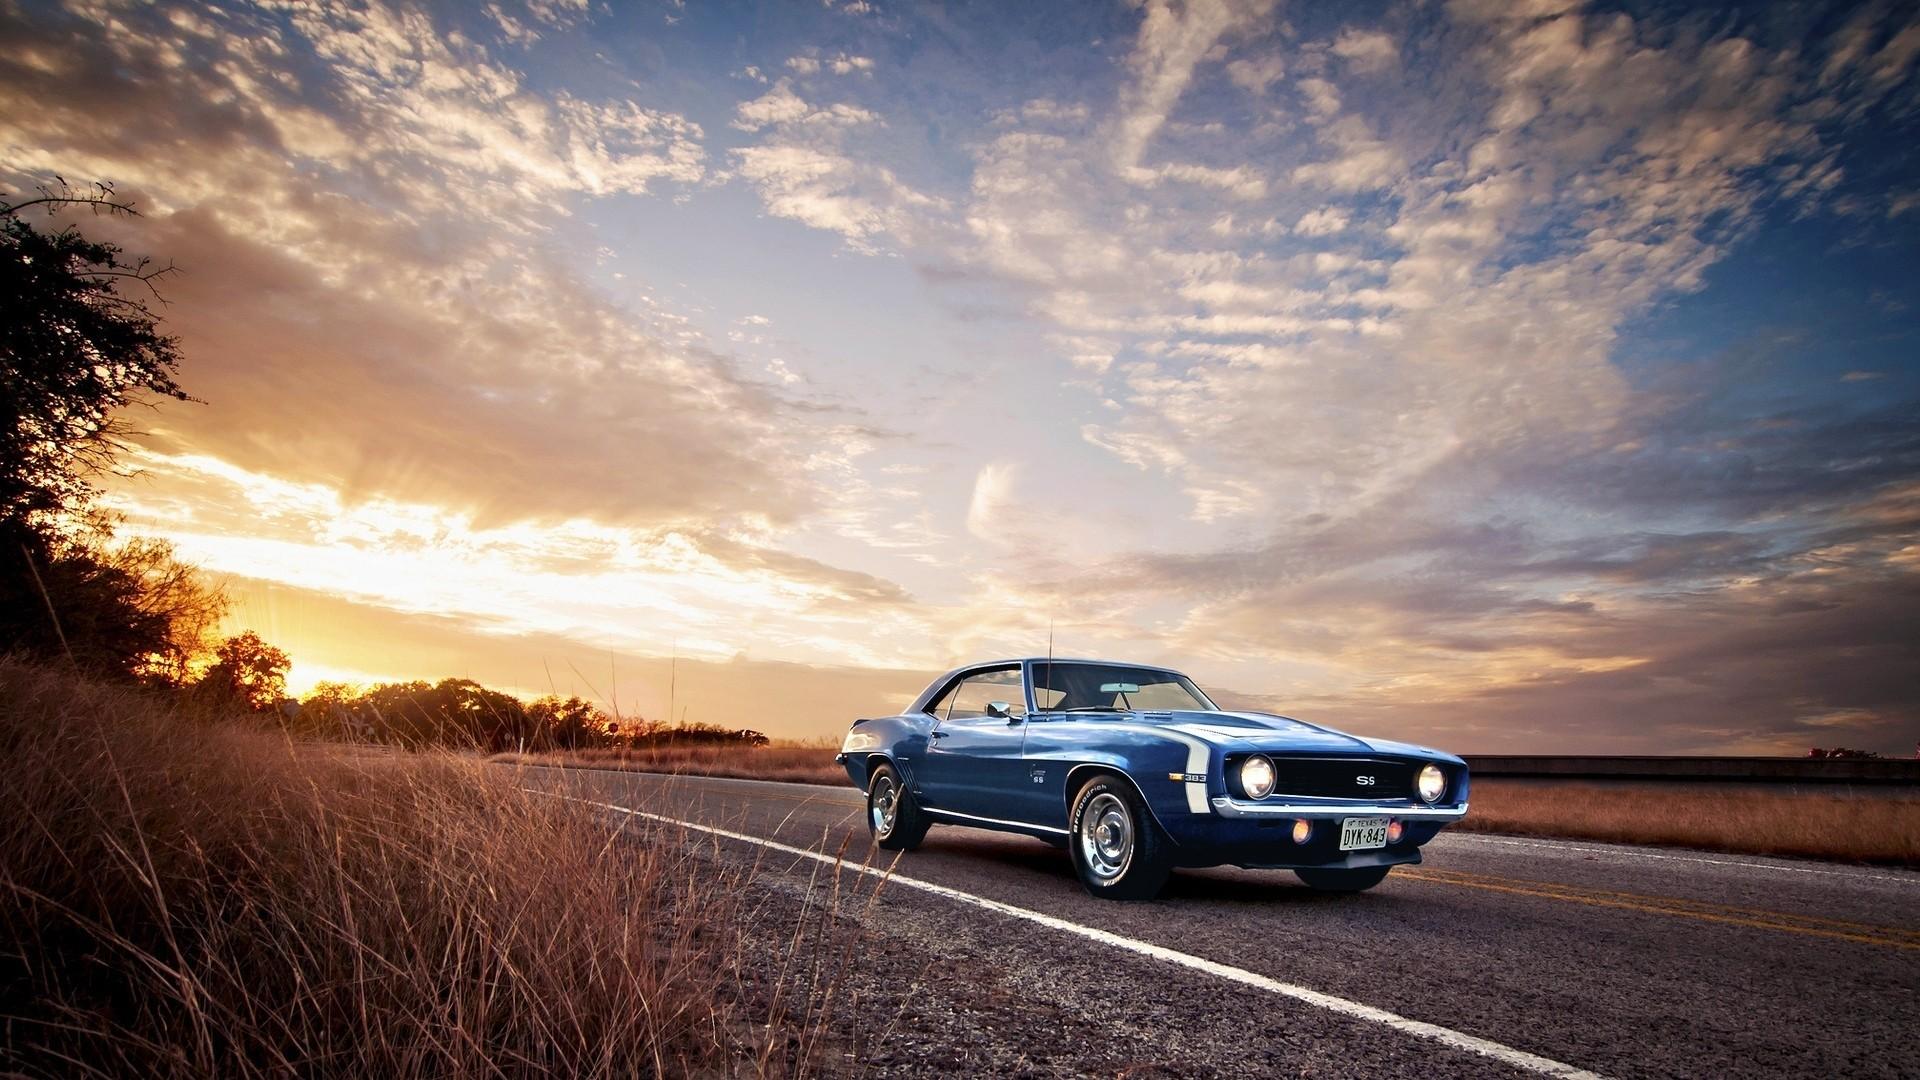 Vintage Cars Wallpapers | Best Wallpapers